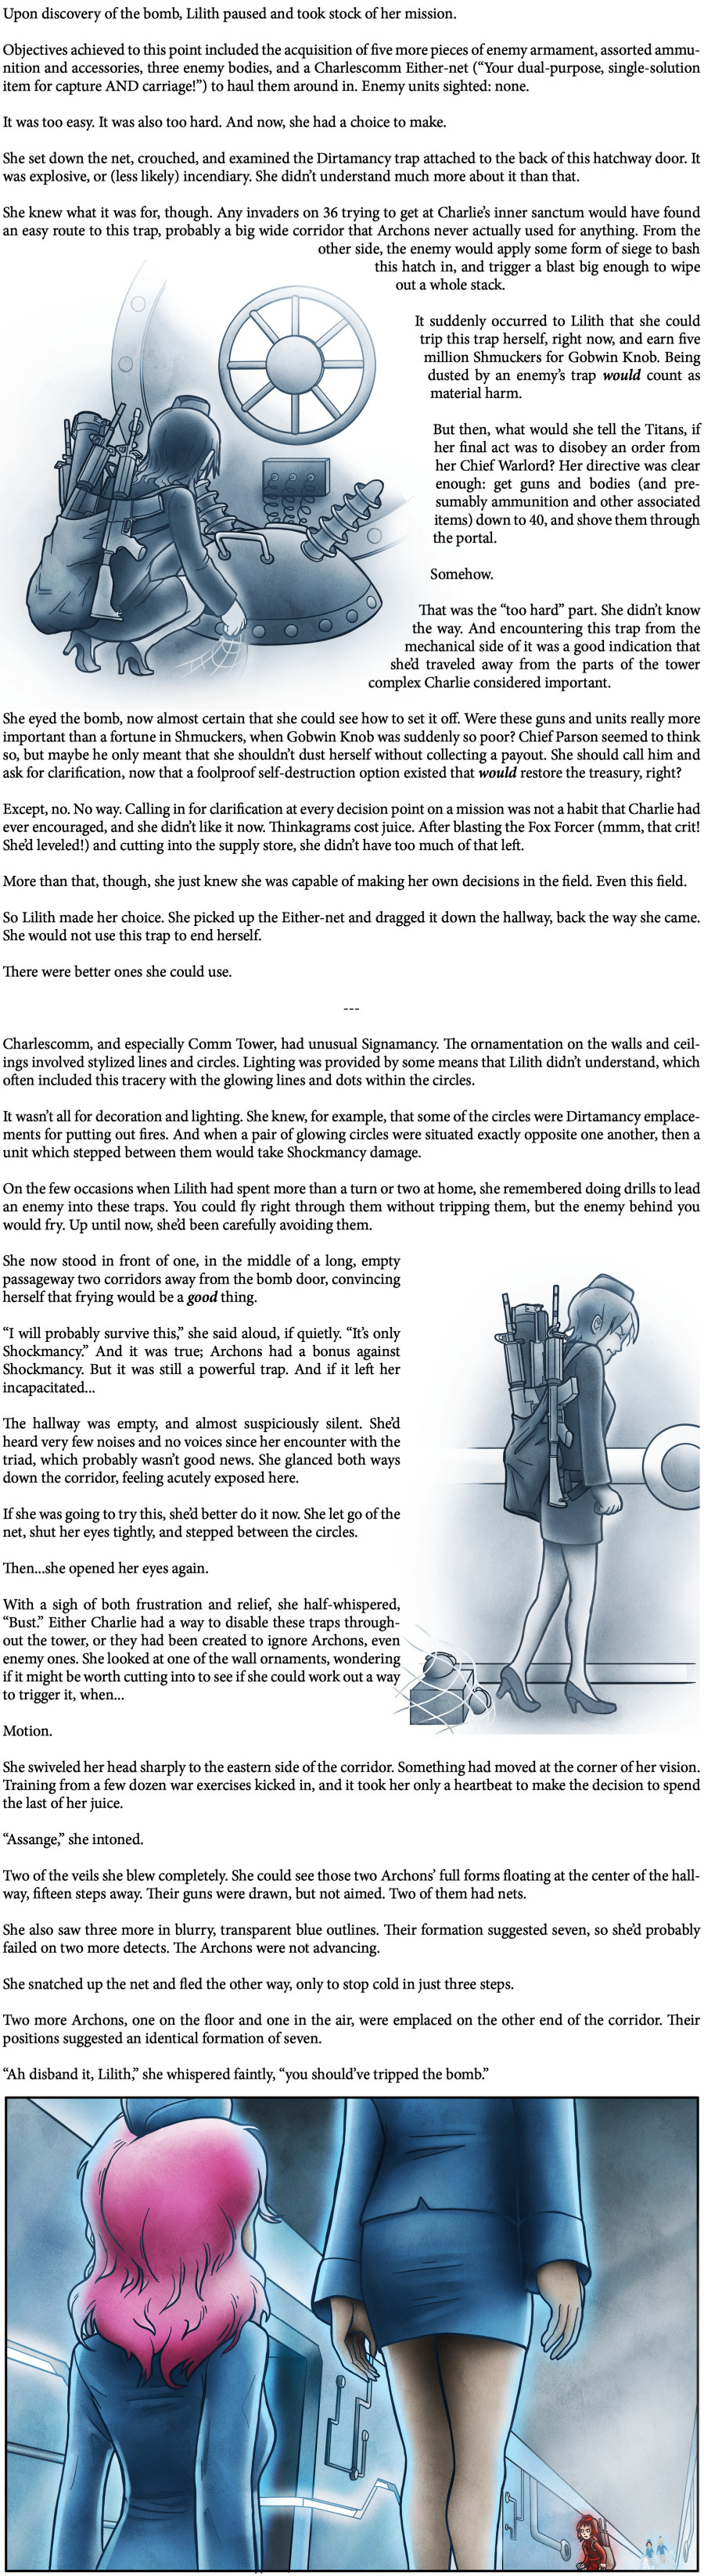 Comic - Book 3 - Page 104